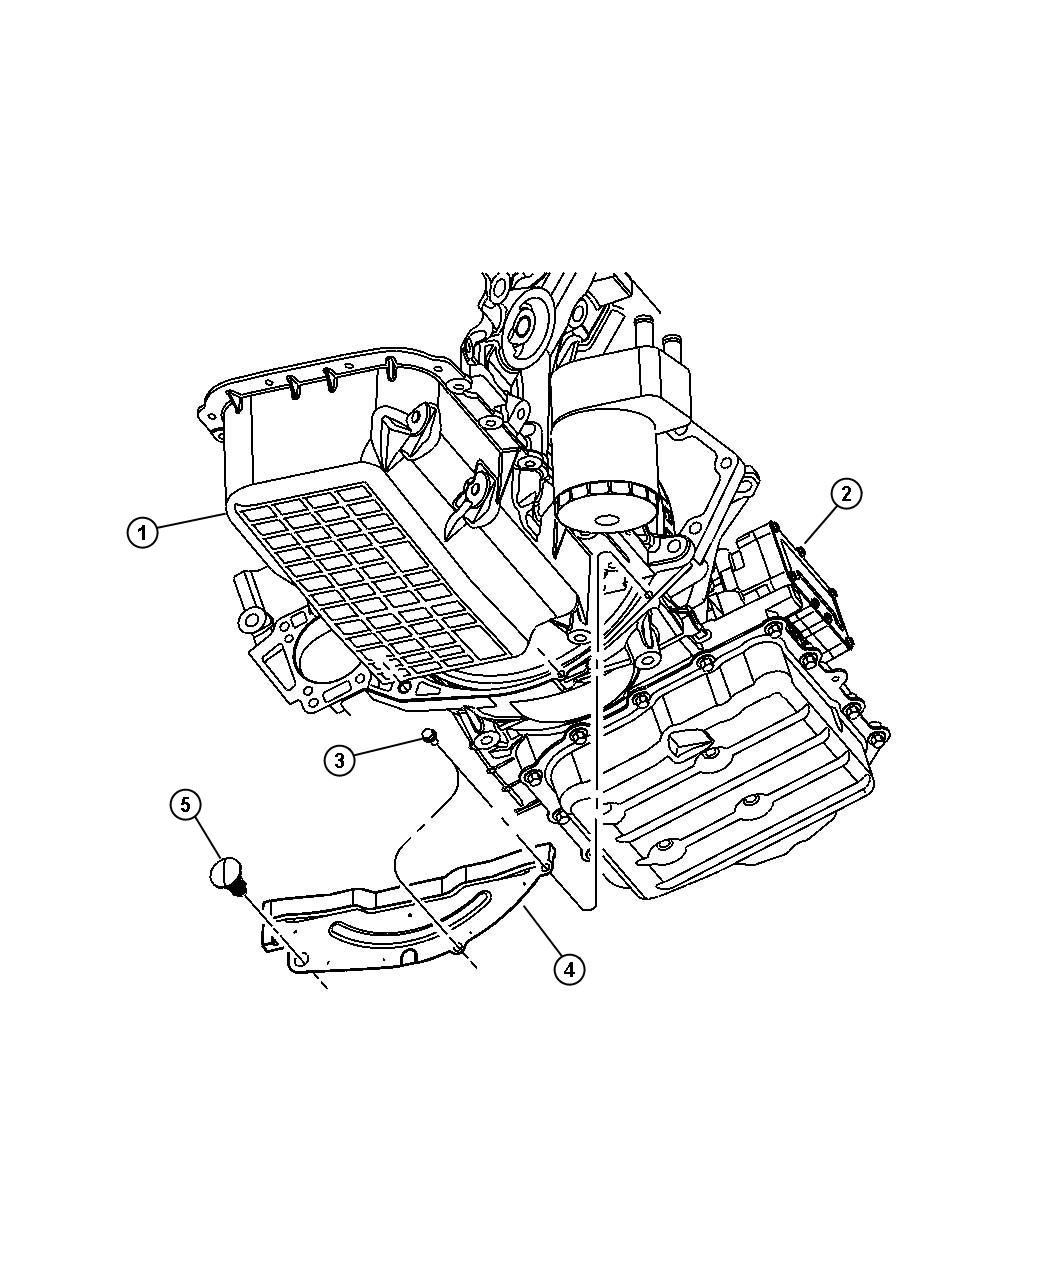 Chrysler Pacifica Trans Pkg With Torque Converter 41te